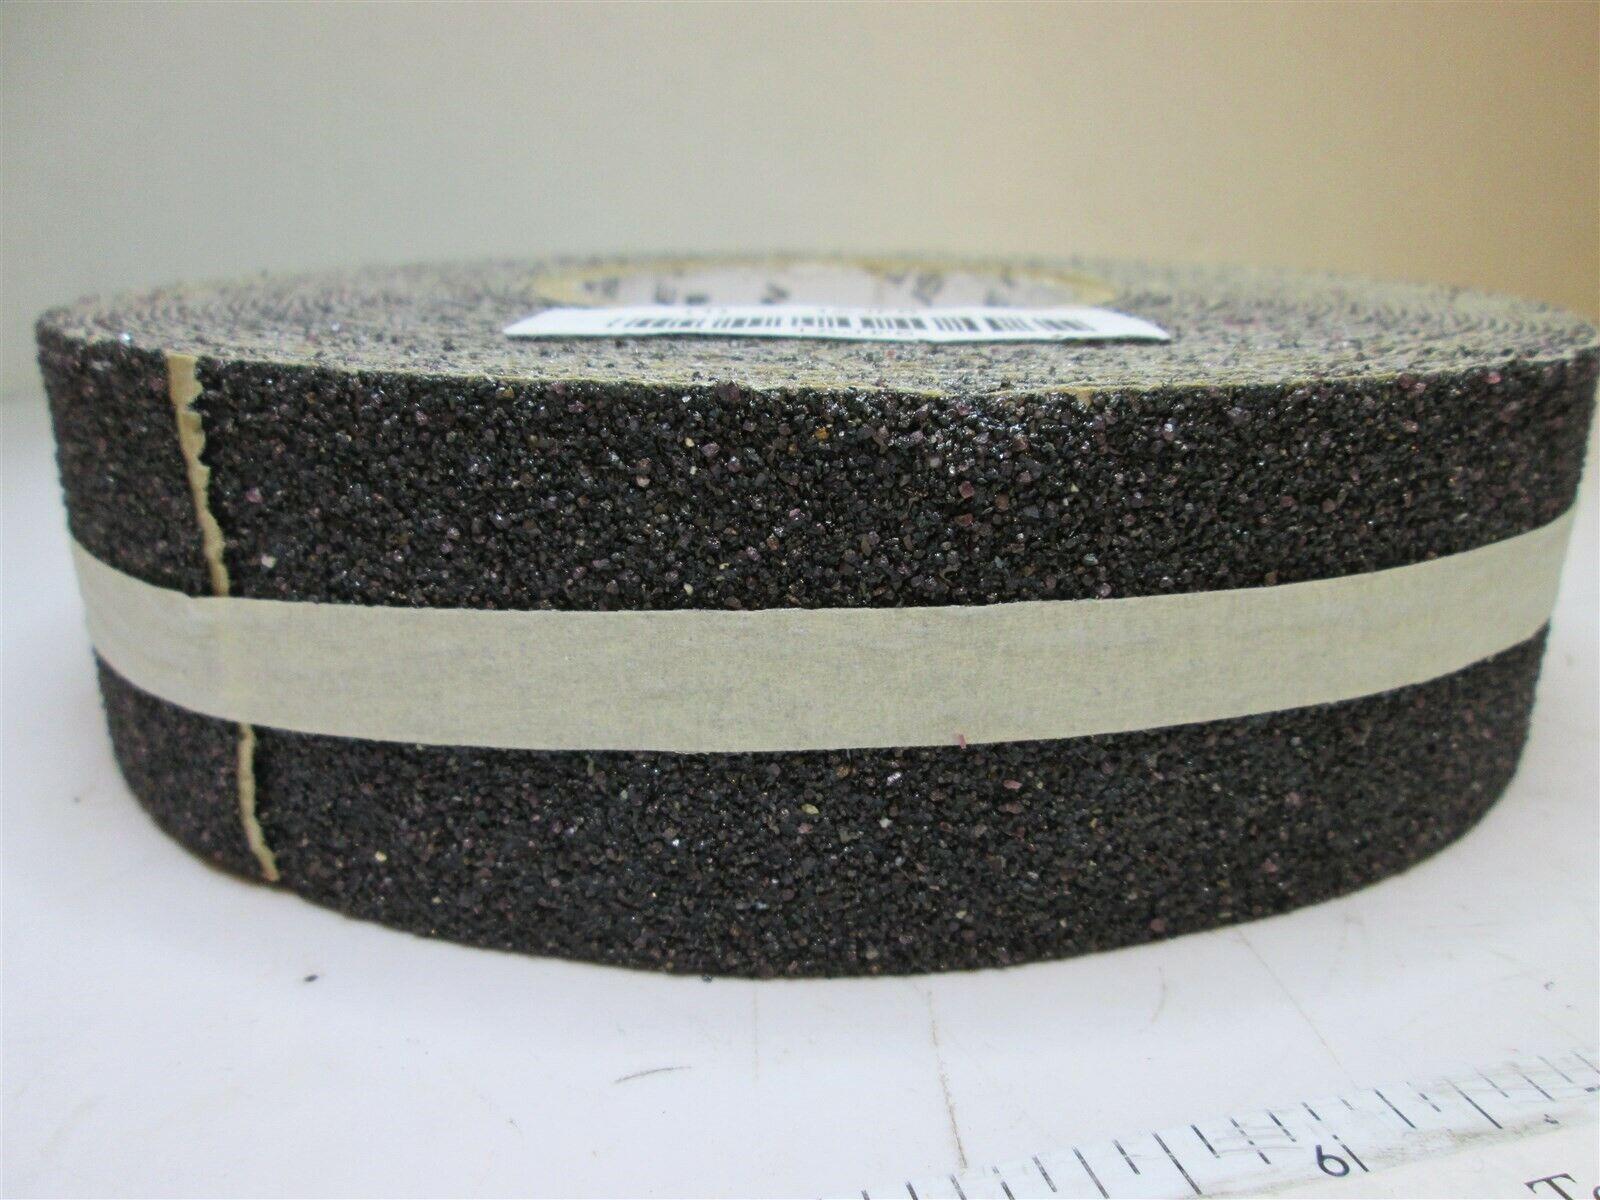 NEW WOOSTER Anti-Slip Tape 2 in x 60 ft - 1AJF6 Flat Black